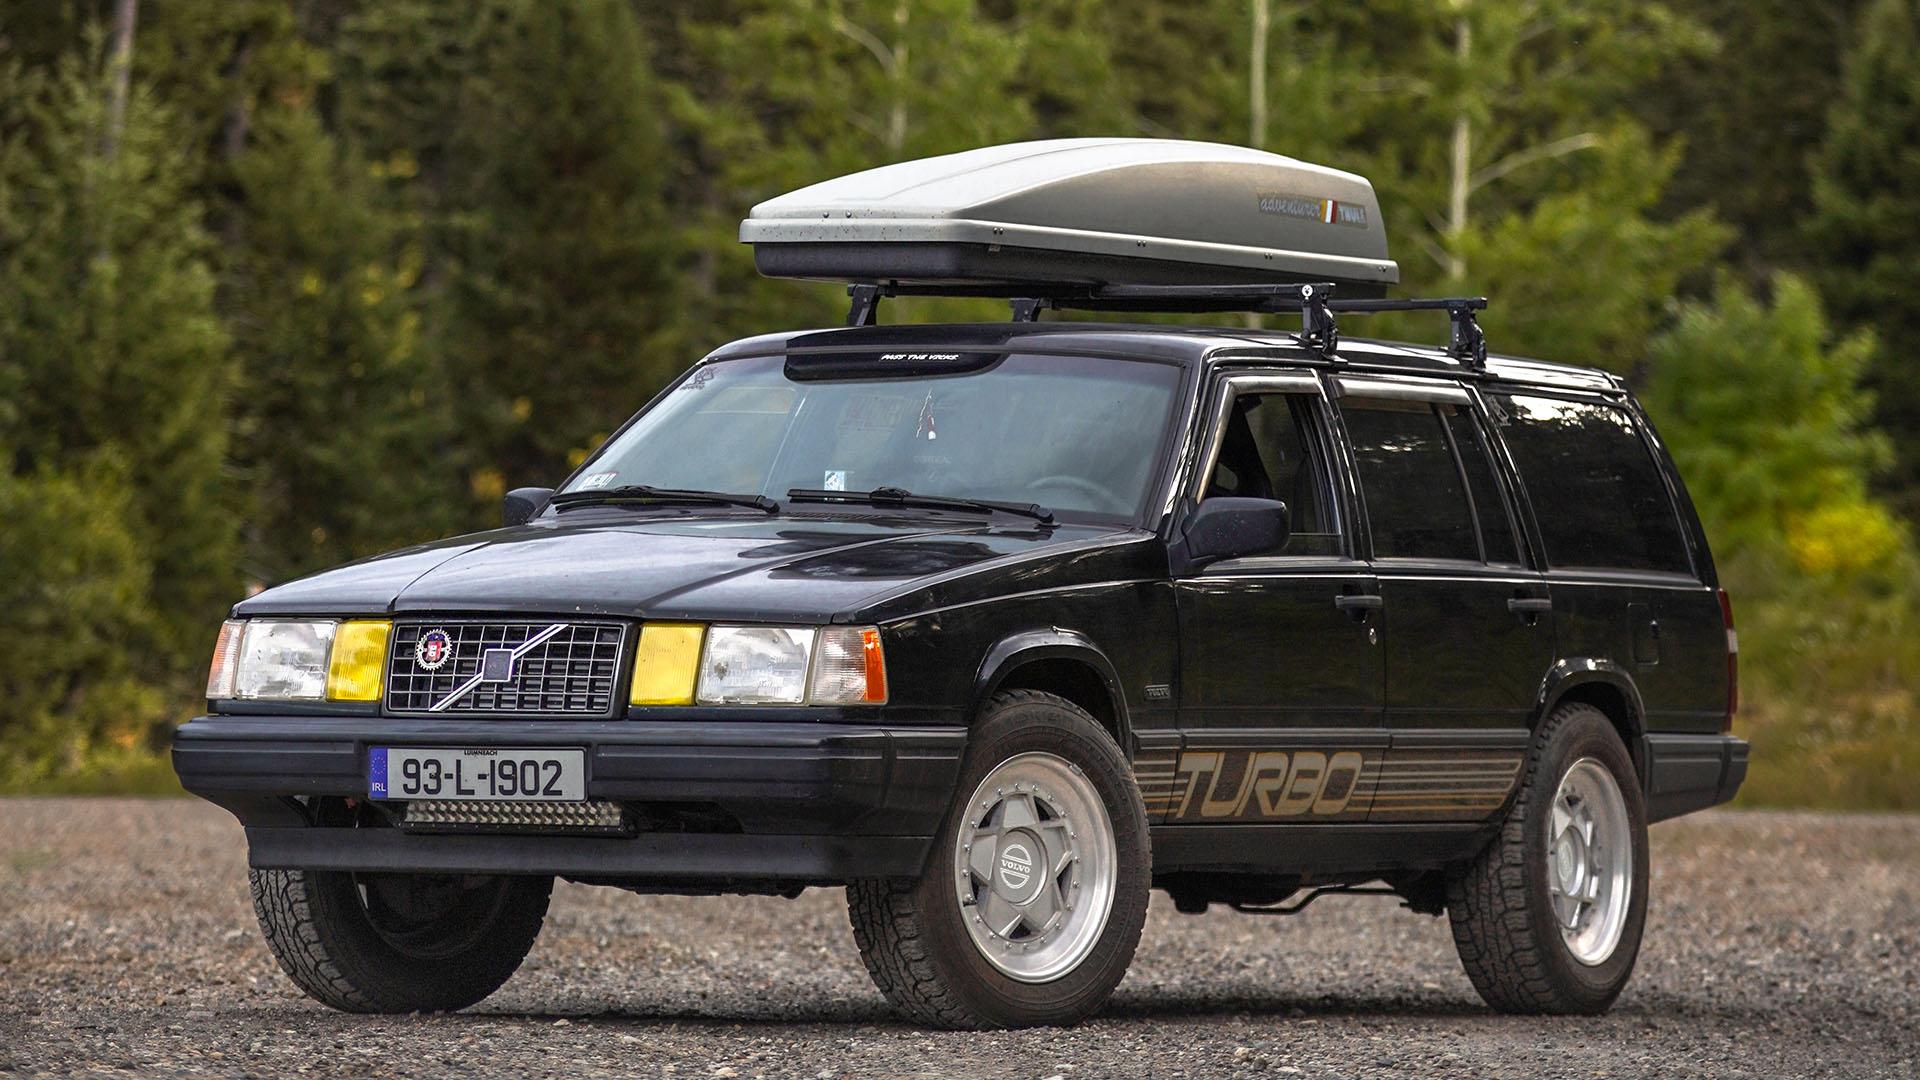 Overland Swedish Metal - Volvo 940 Turbo Wagon